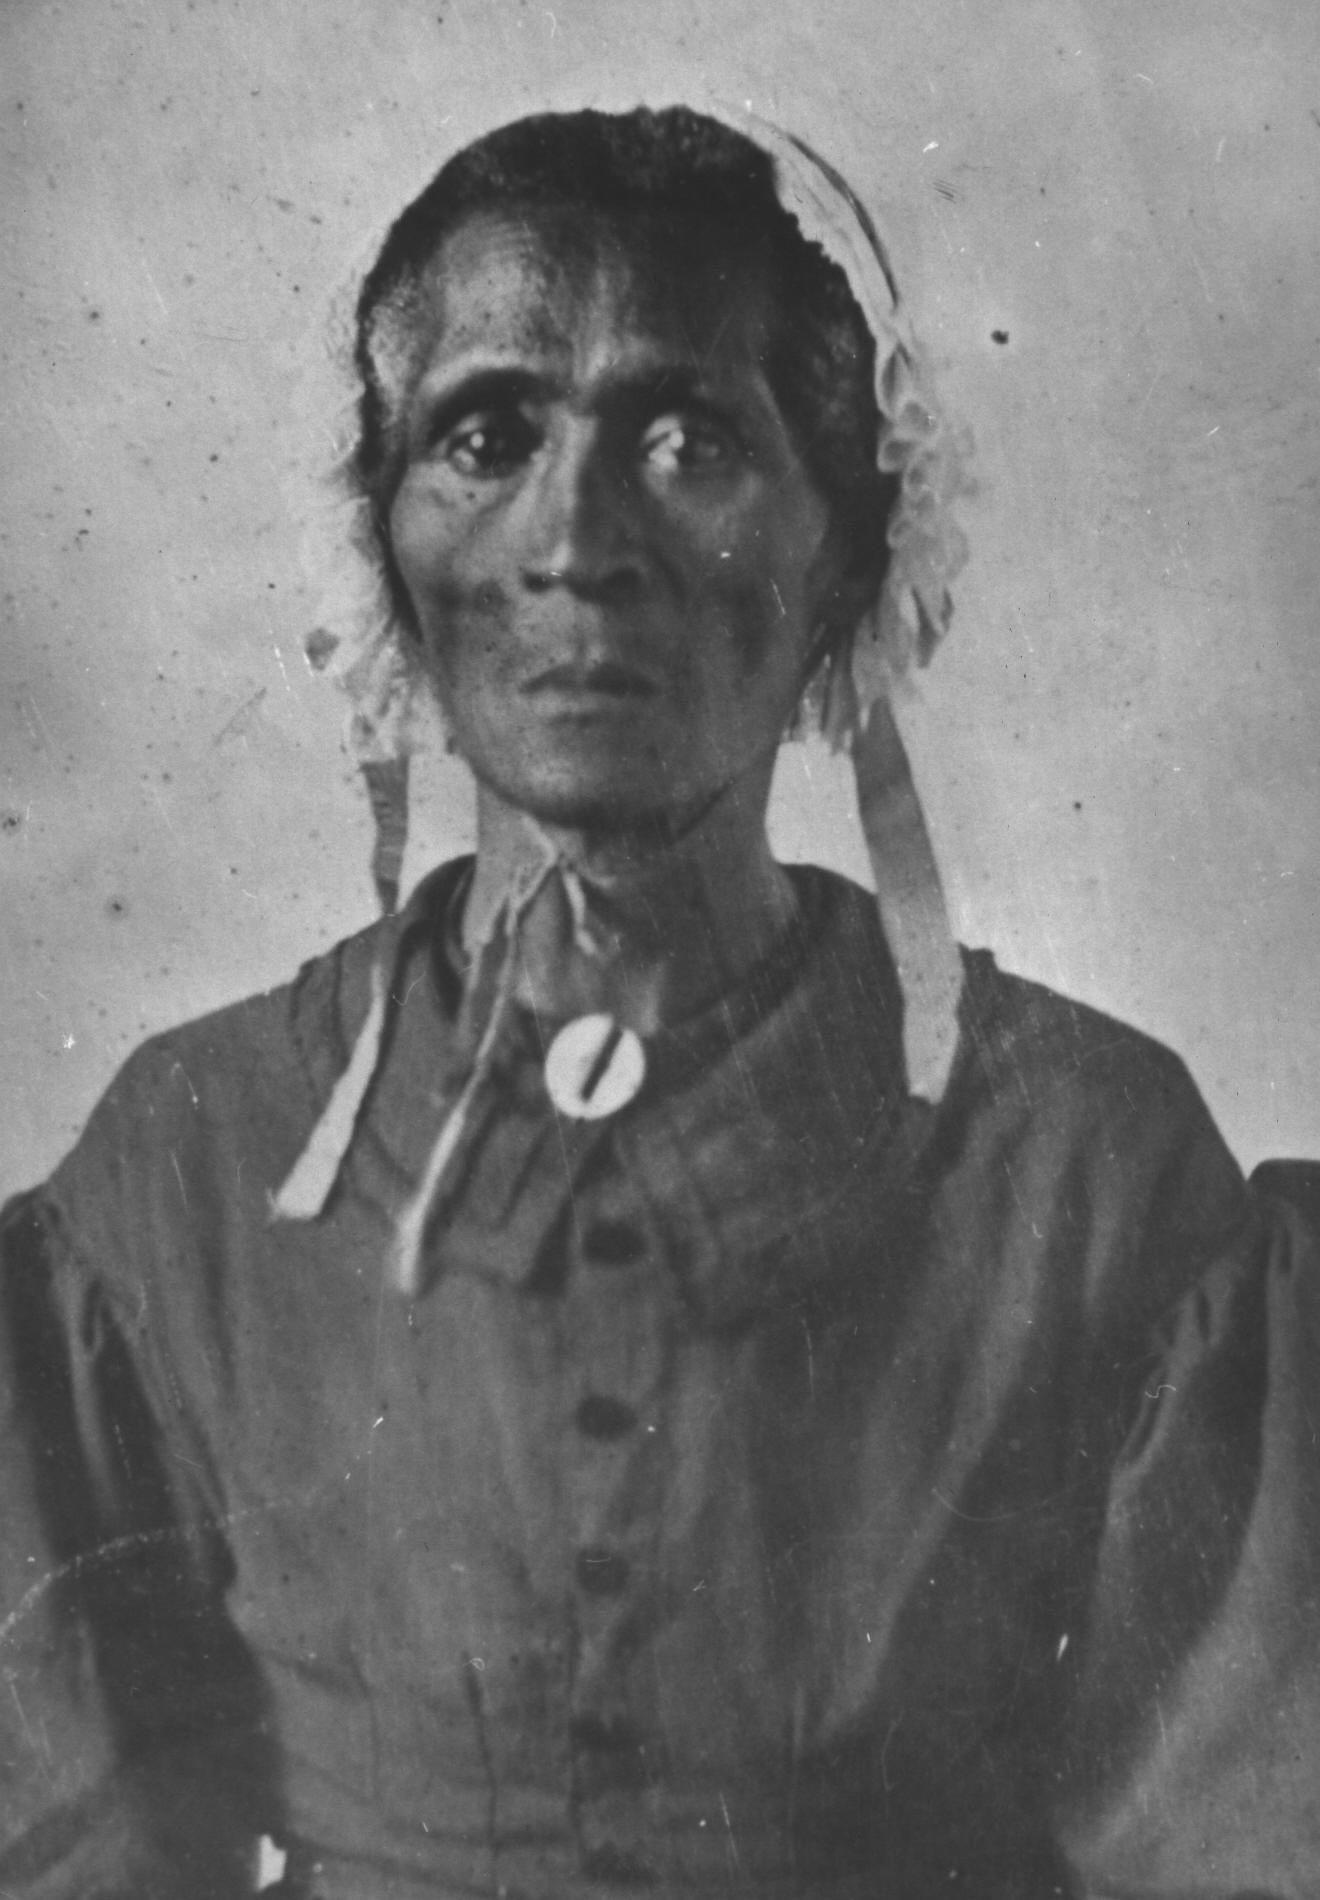 Negra indigena indigenous black girl - 1 6